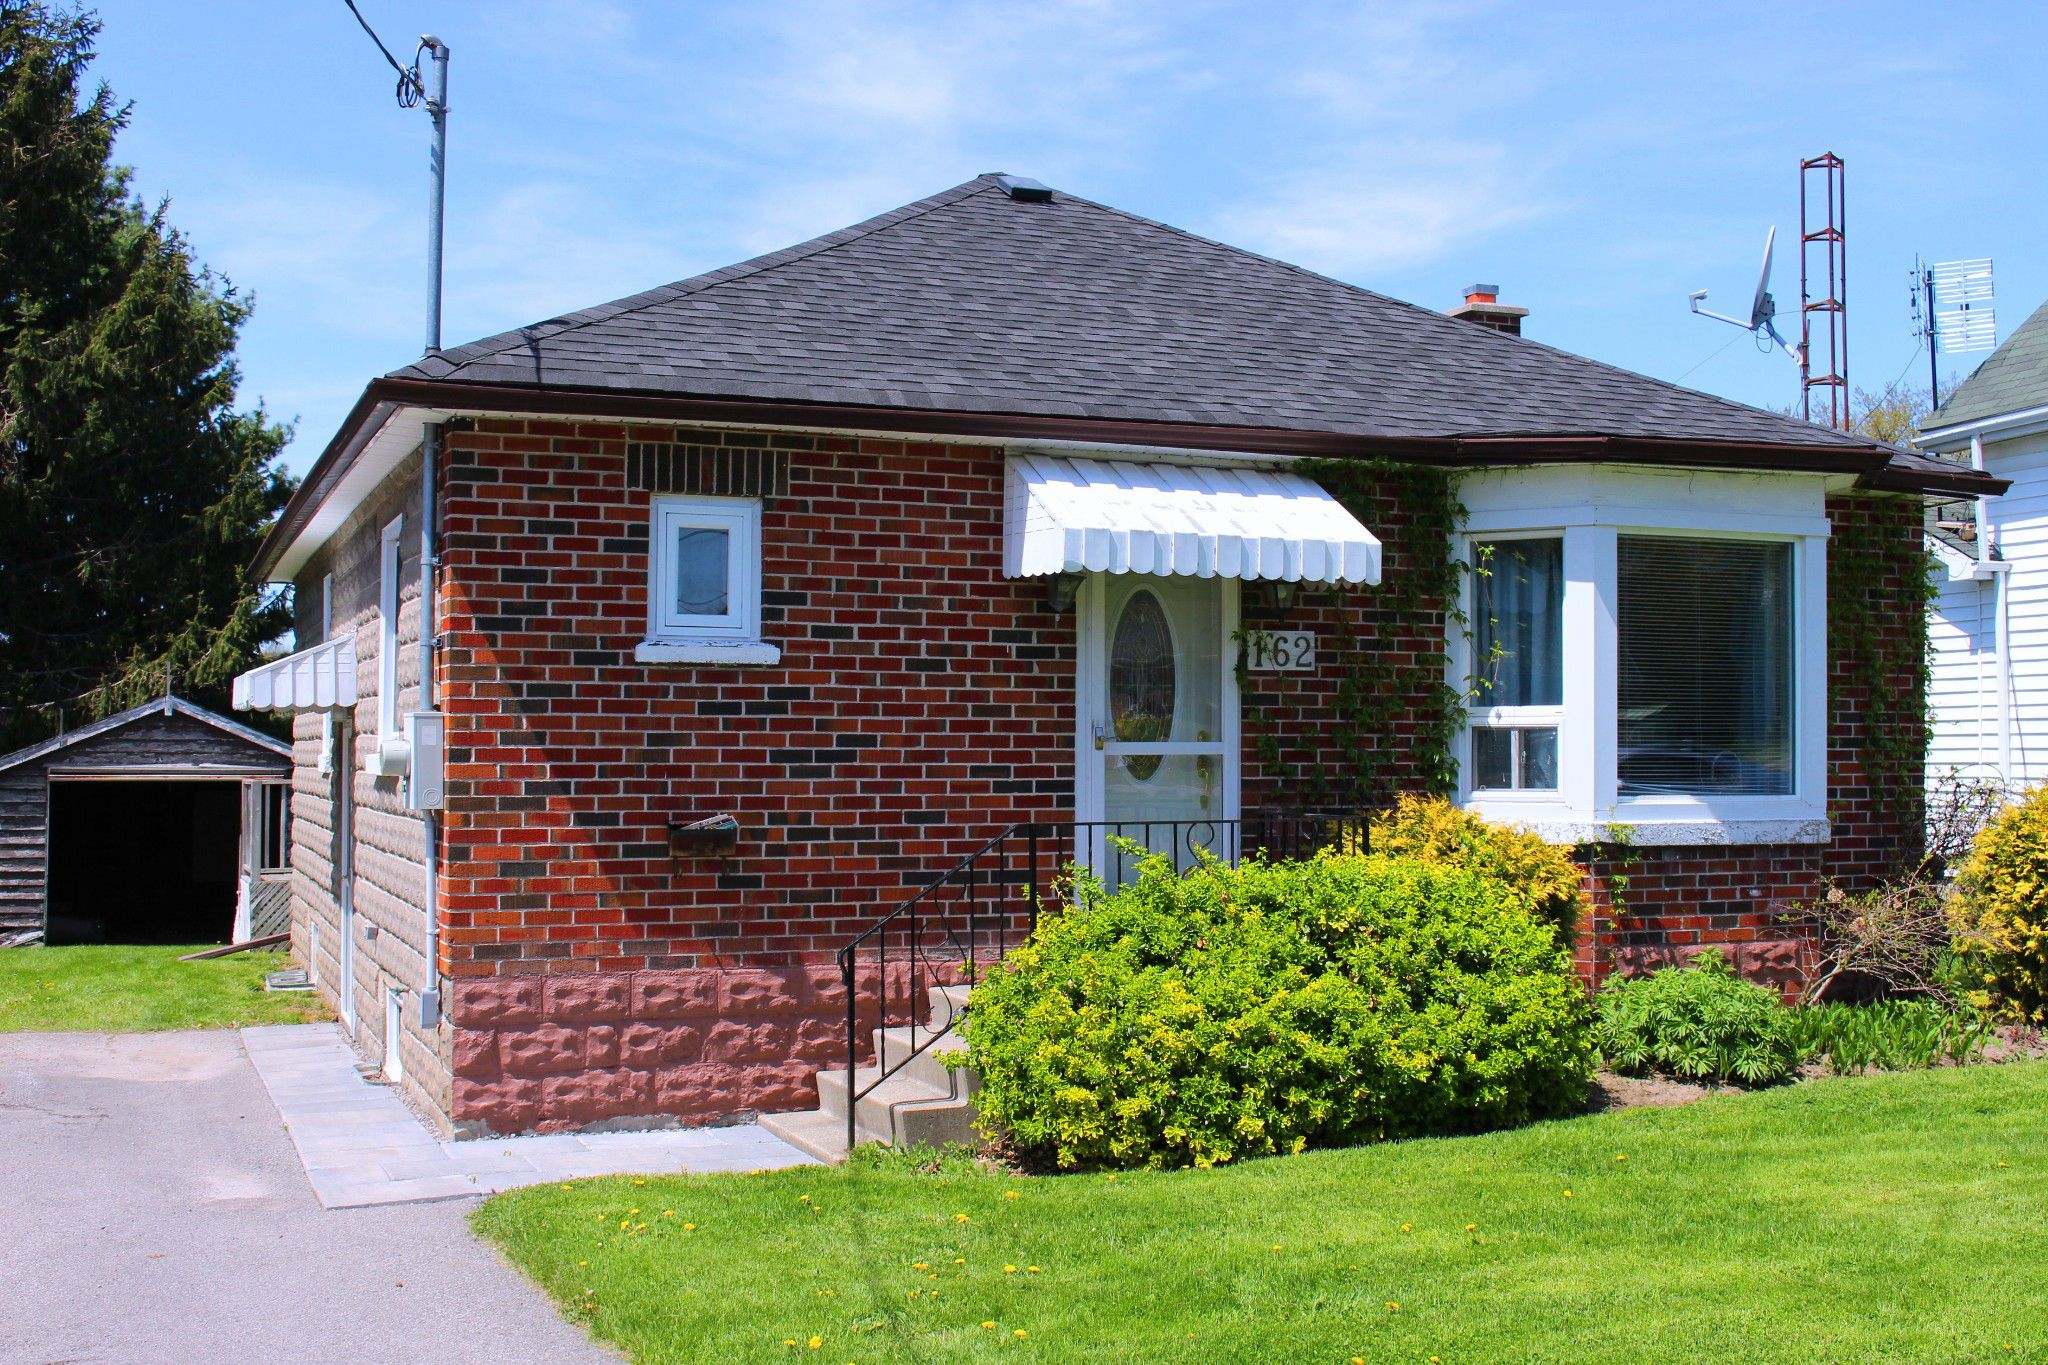 Main Photo: 162 Hope Street N in Port Hope: Residential Detached for sale : MLS®# 128055